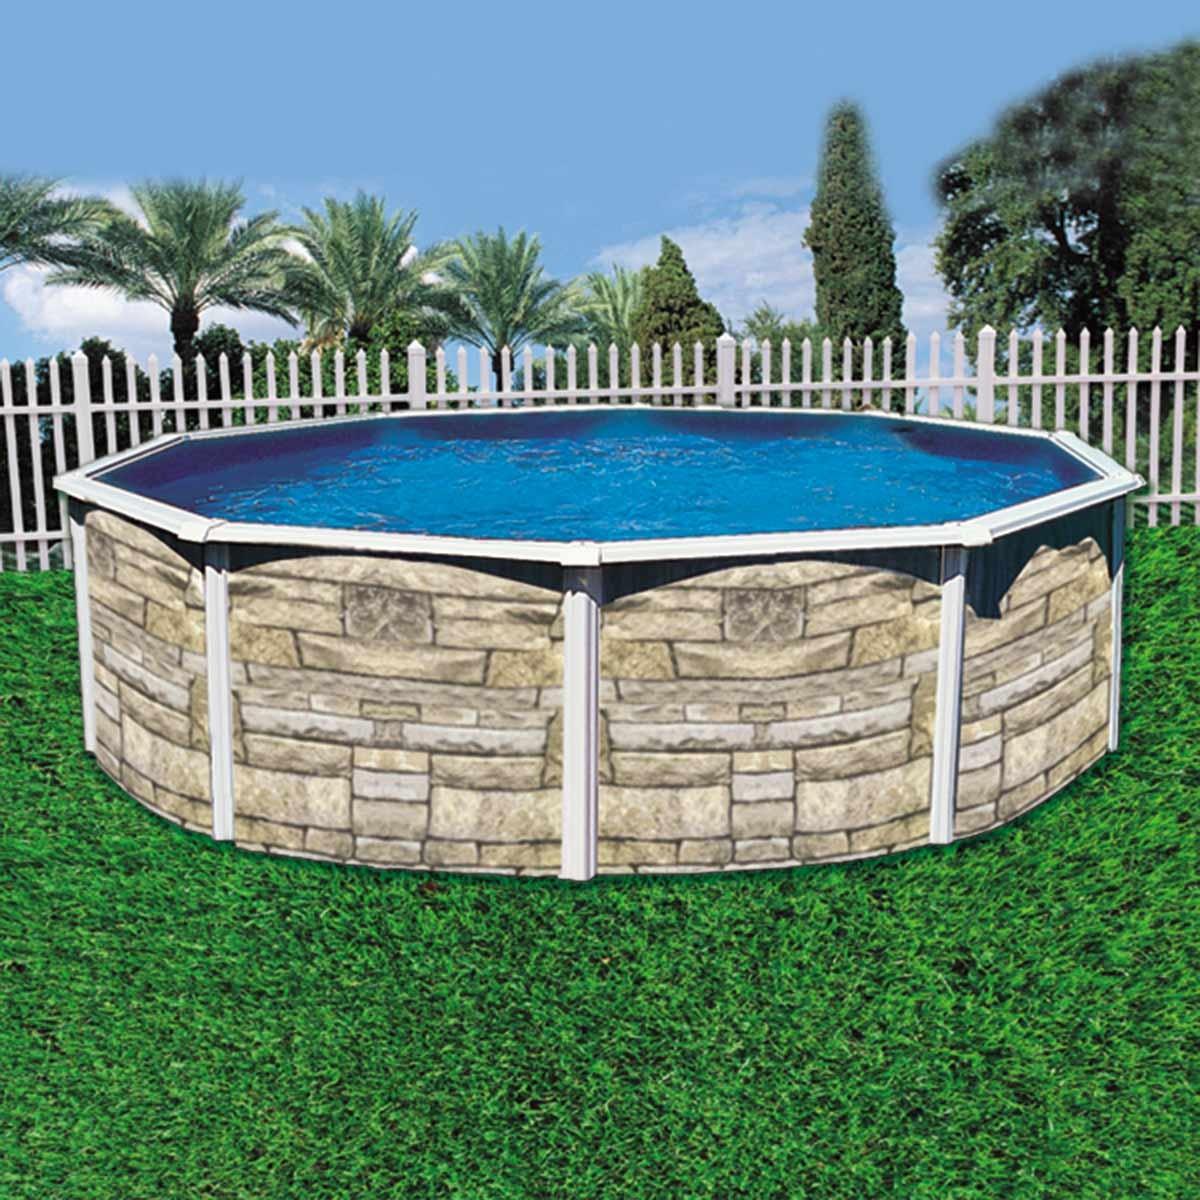 Piscina desmontable rocca k2o de acero piscinas ferromar - Piscina desmontable acero ...